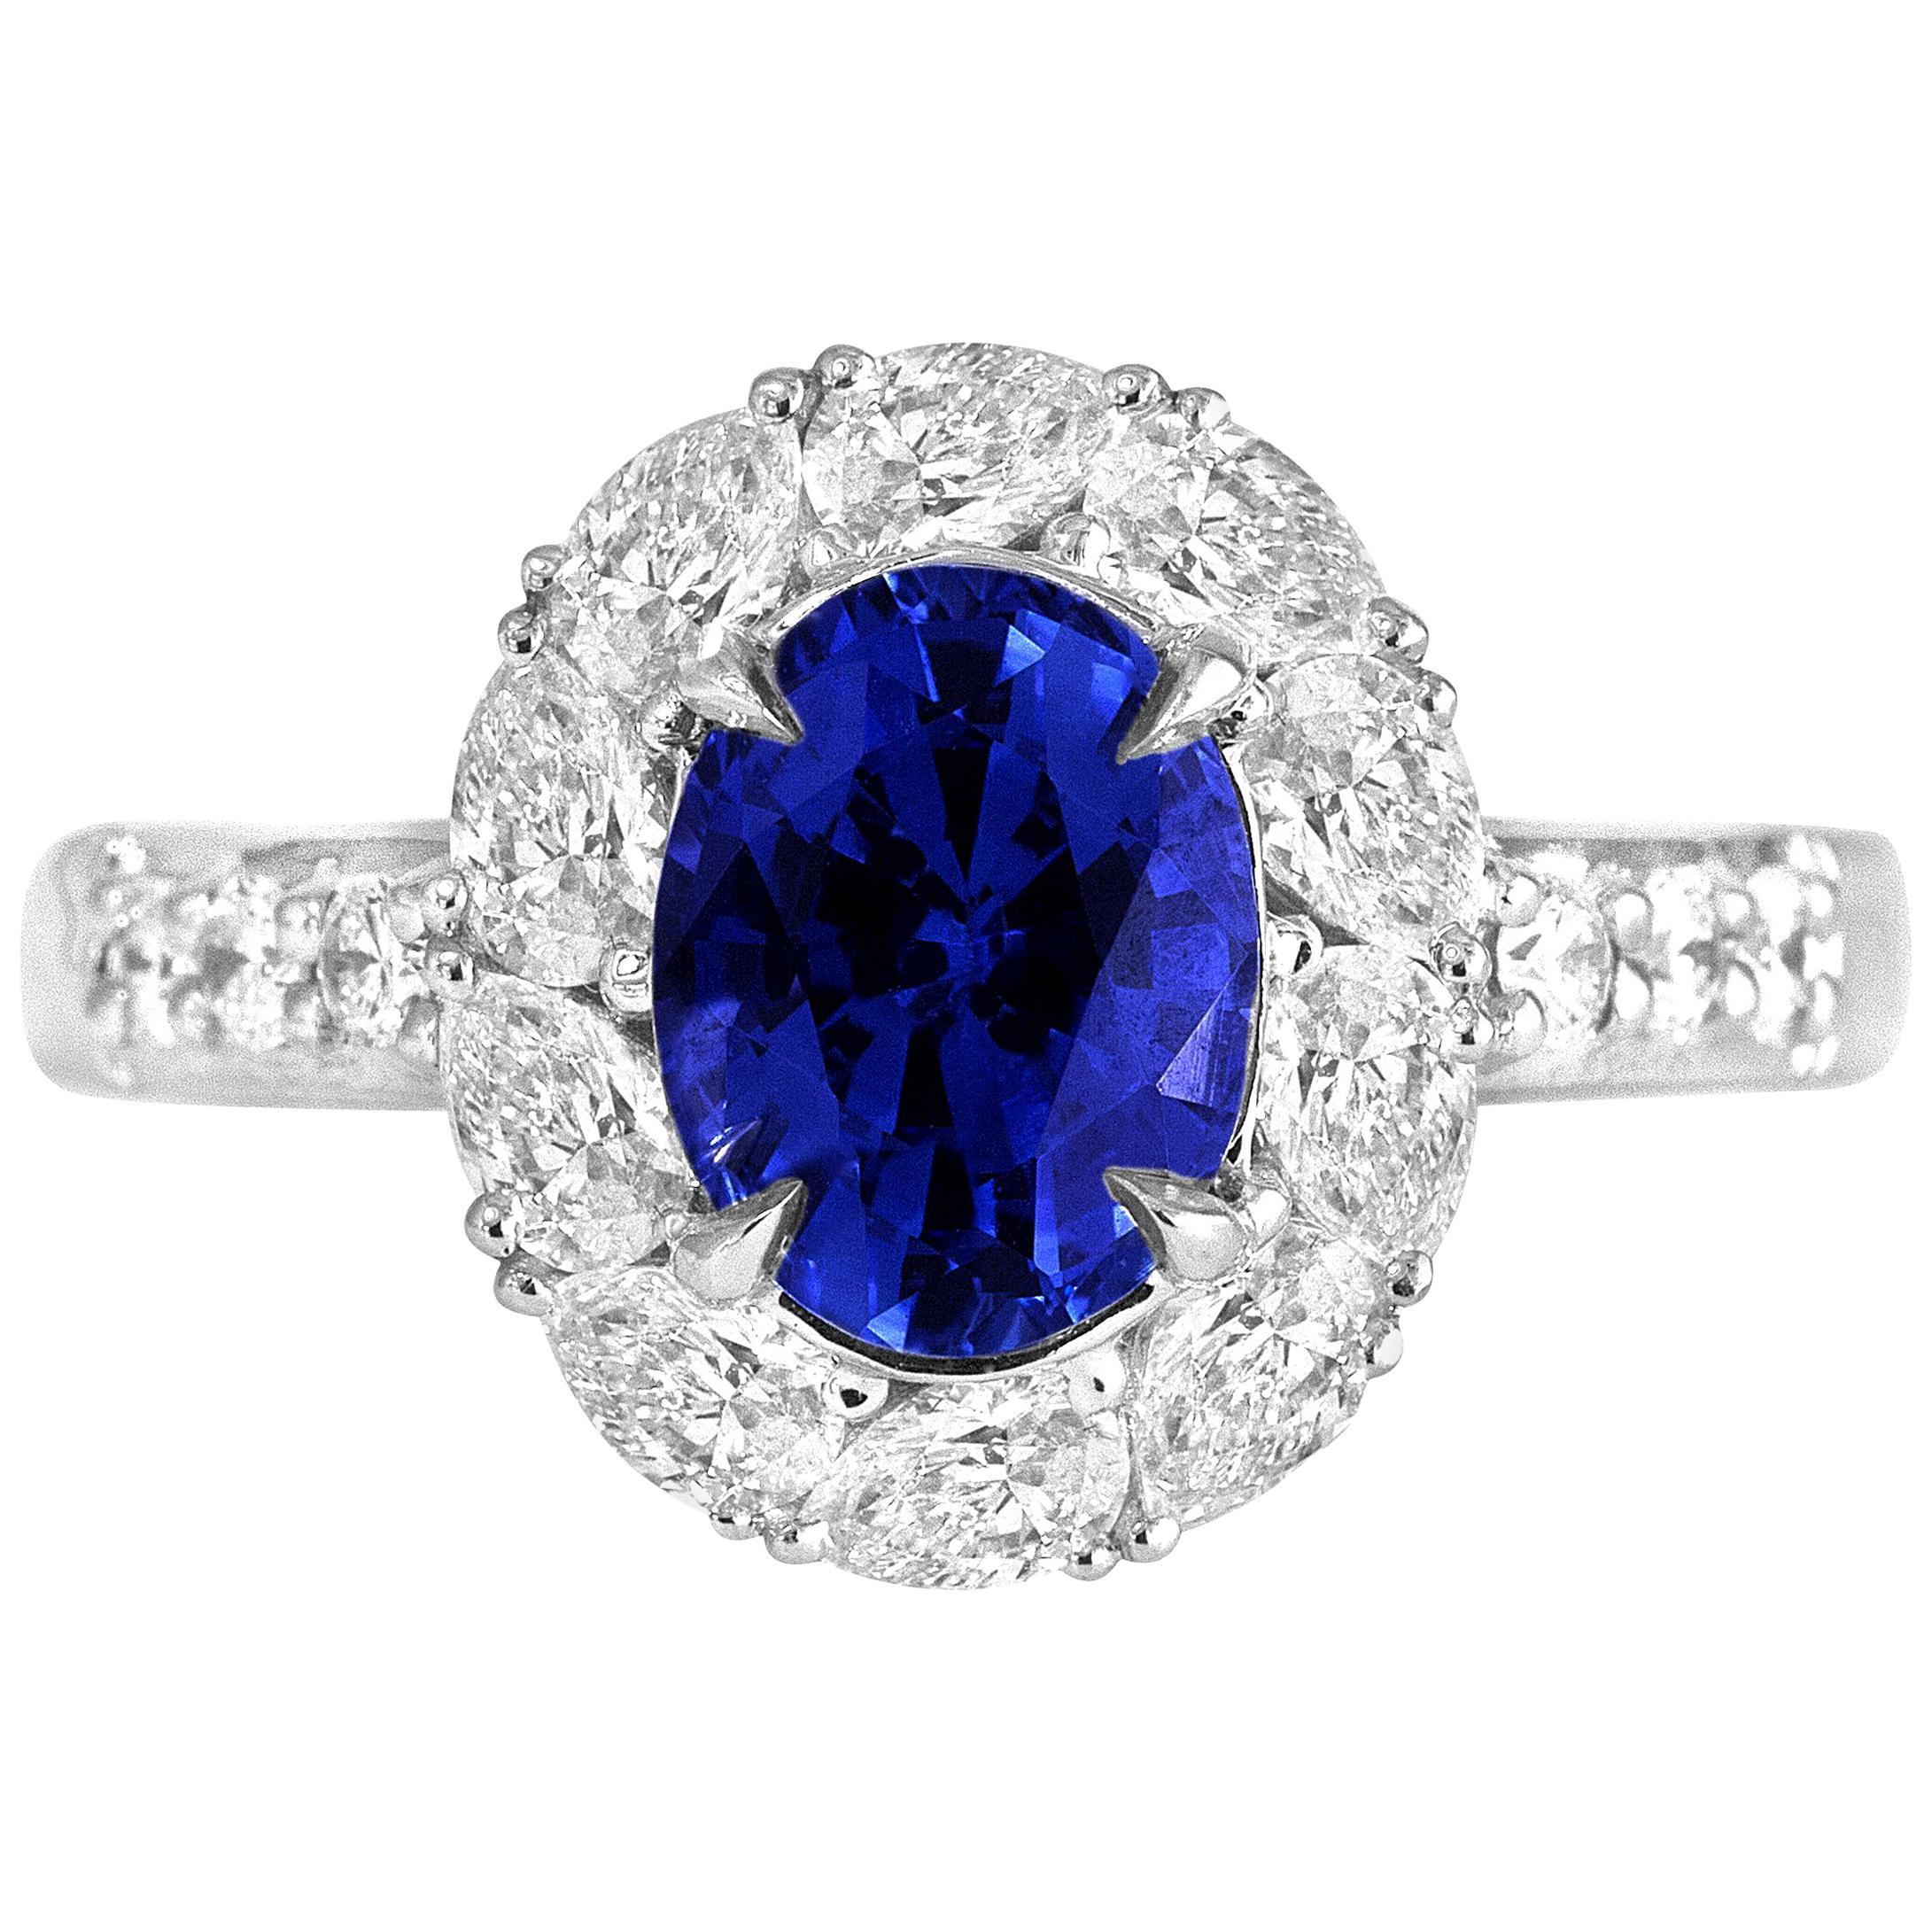 DiamondTown GAL Certified 1.84 Carat Oval Cut Ceylon Sapphire Ring